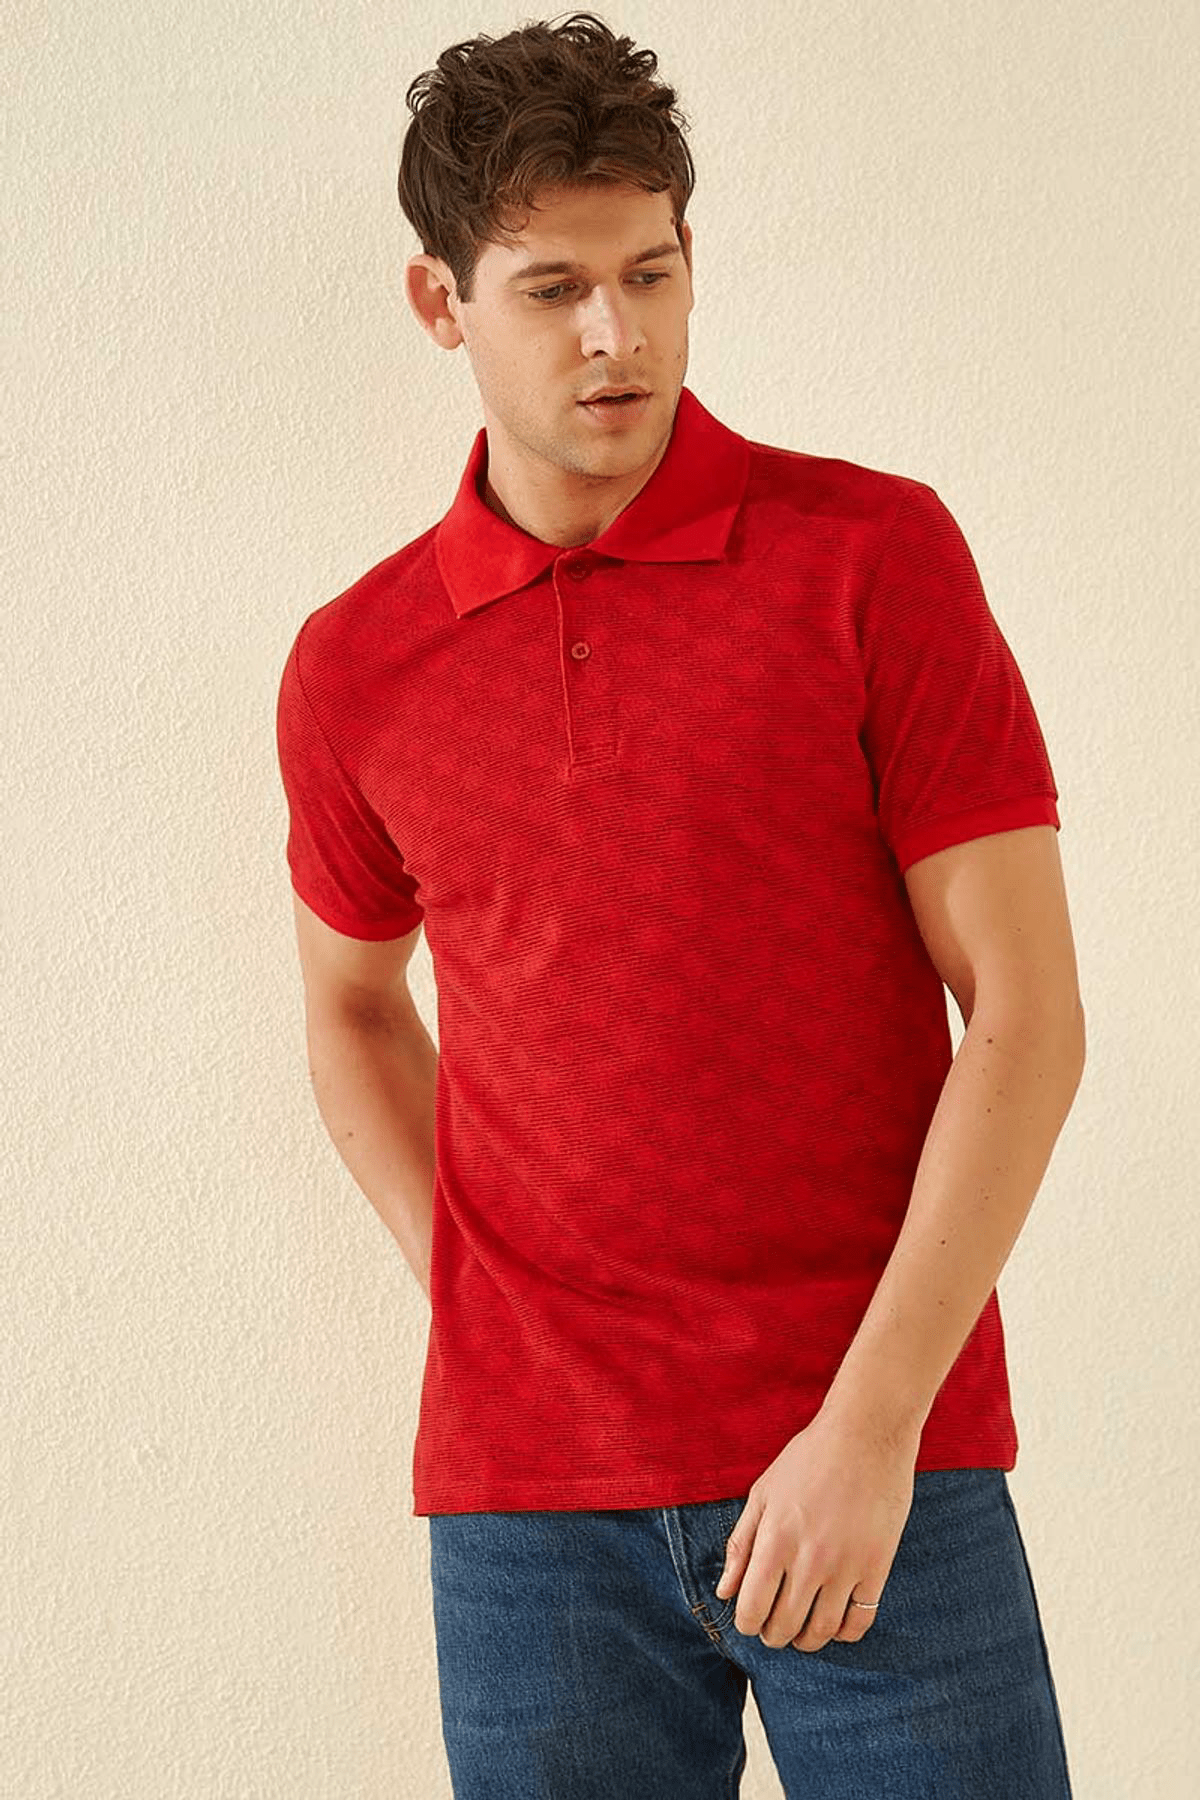 Tommy Life Baskılı Polo Yaka Kırmızı Erkek T-Shirt T08ER-87796_1 0